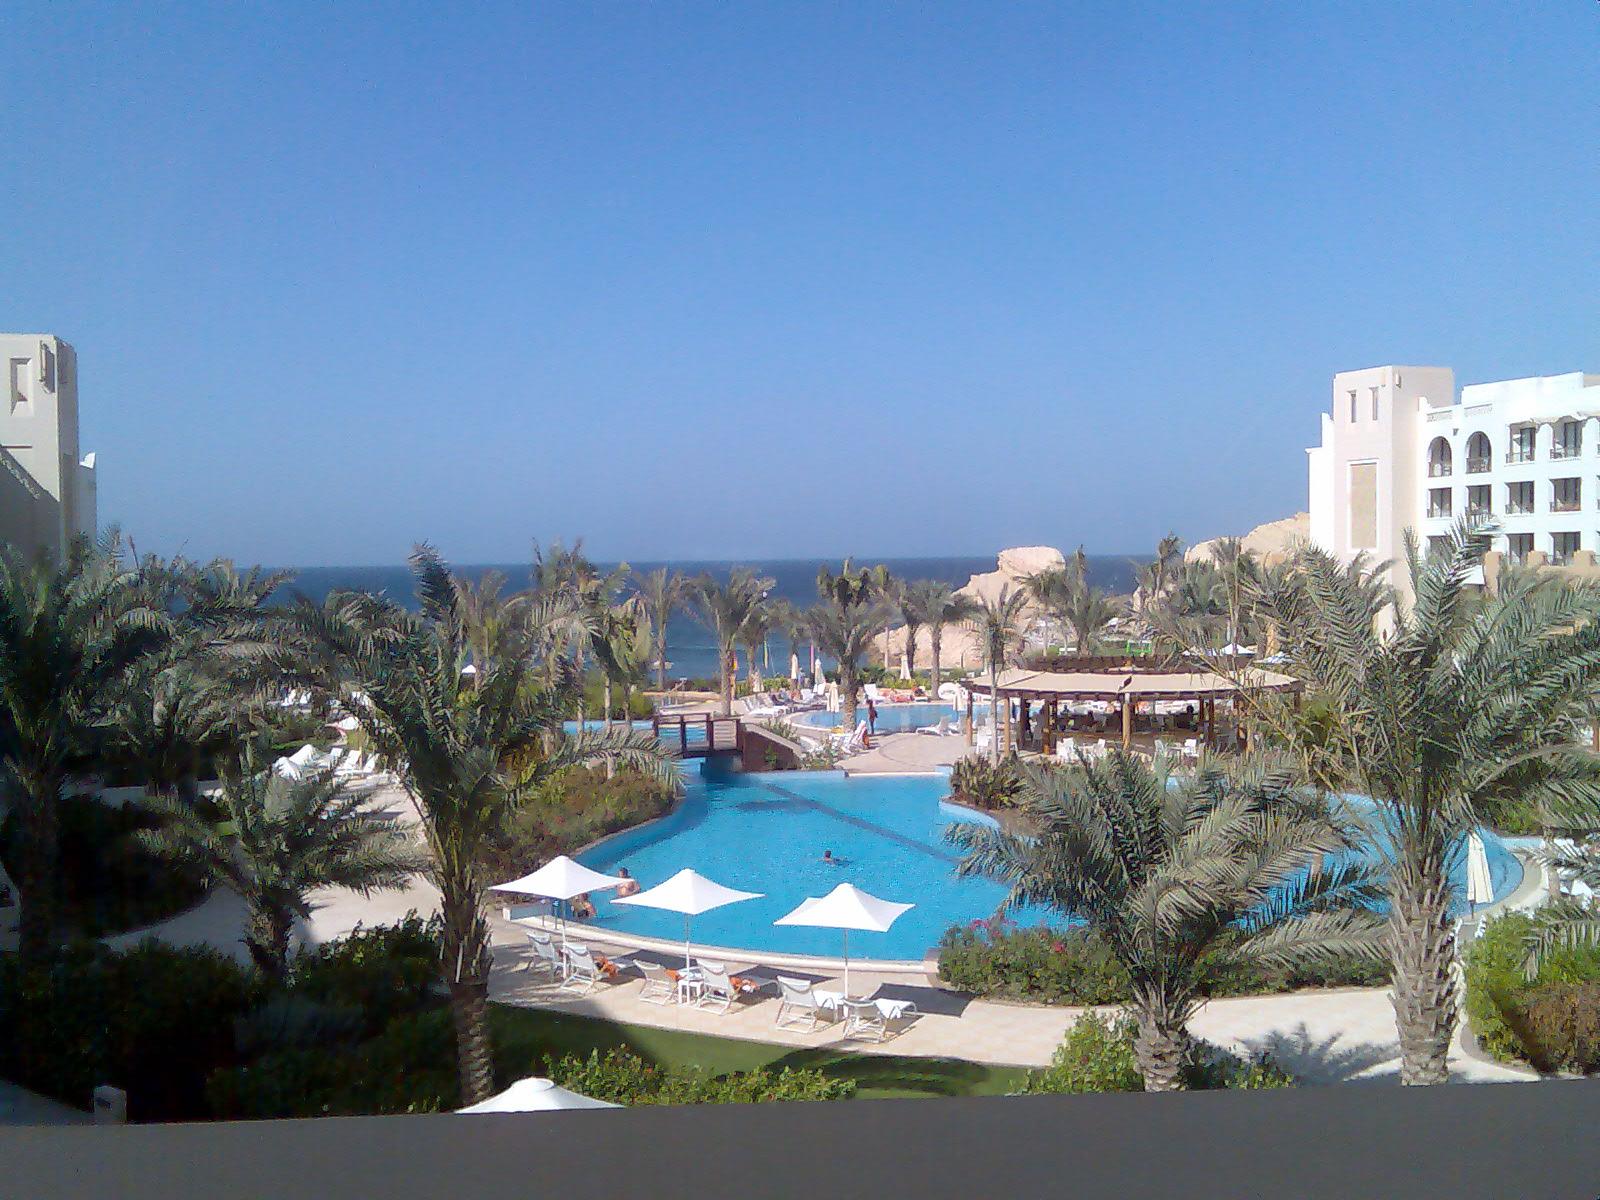 Hotels In Carlsbad Ca